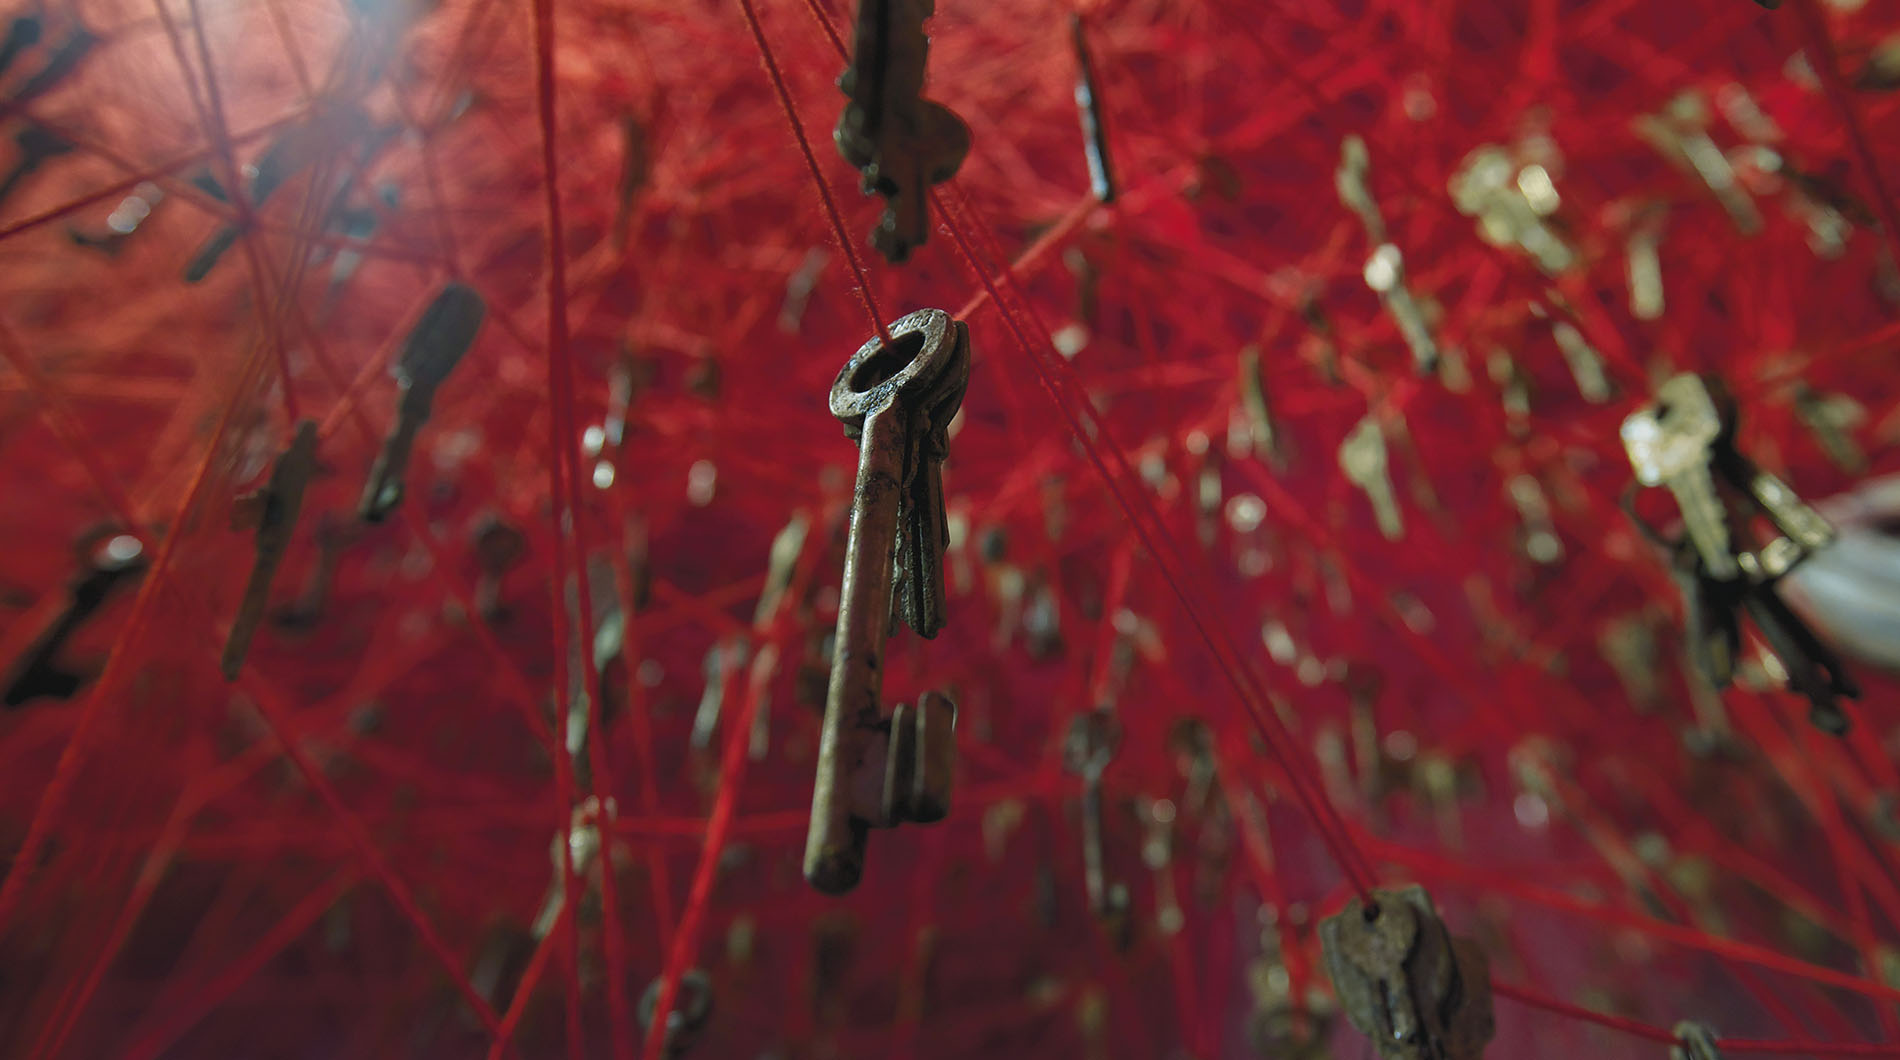 """The Key in the Hand"" detail, photo by Sunhi Mang, 2015.veneziabiennale-japanpavilion.jp"